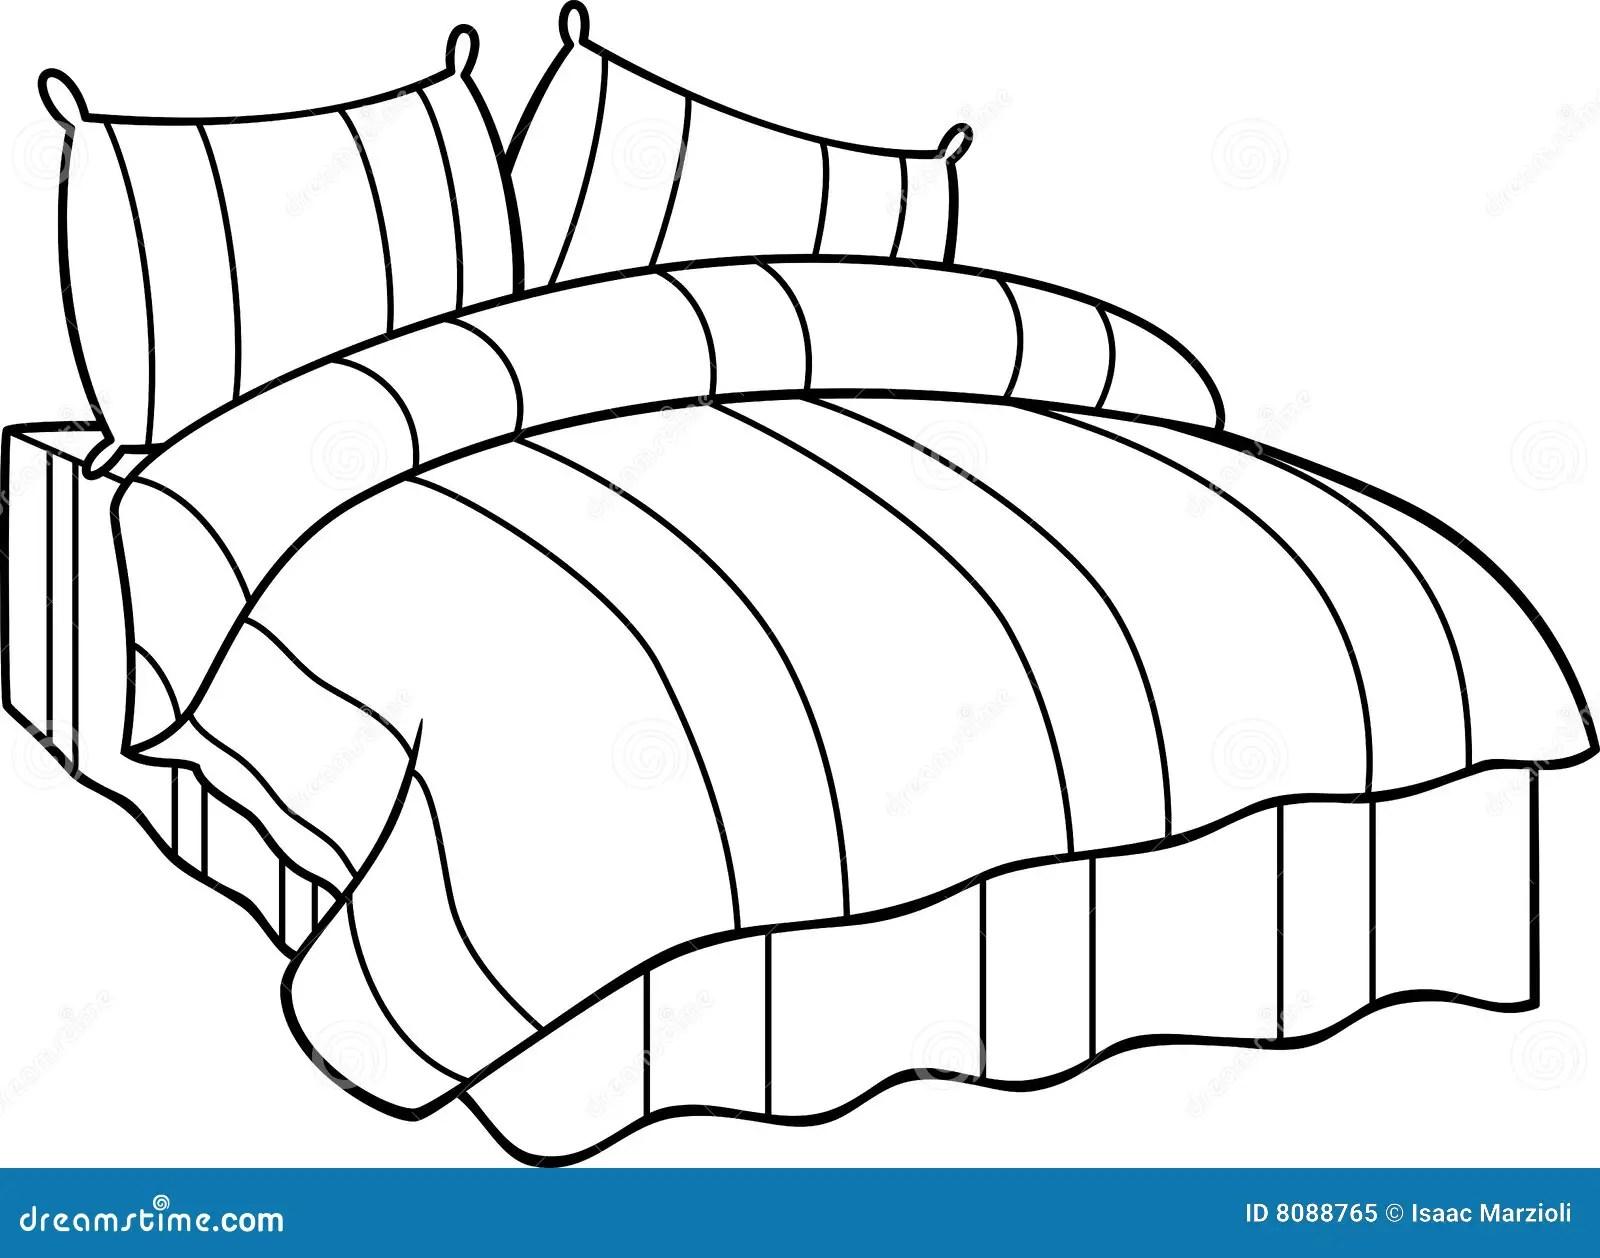 Bed Stock Vector Illustration Of Vector Illustration